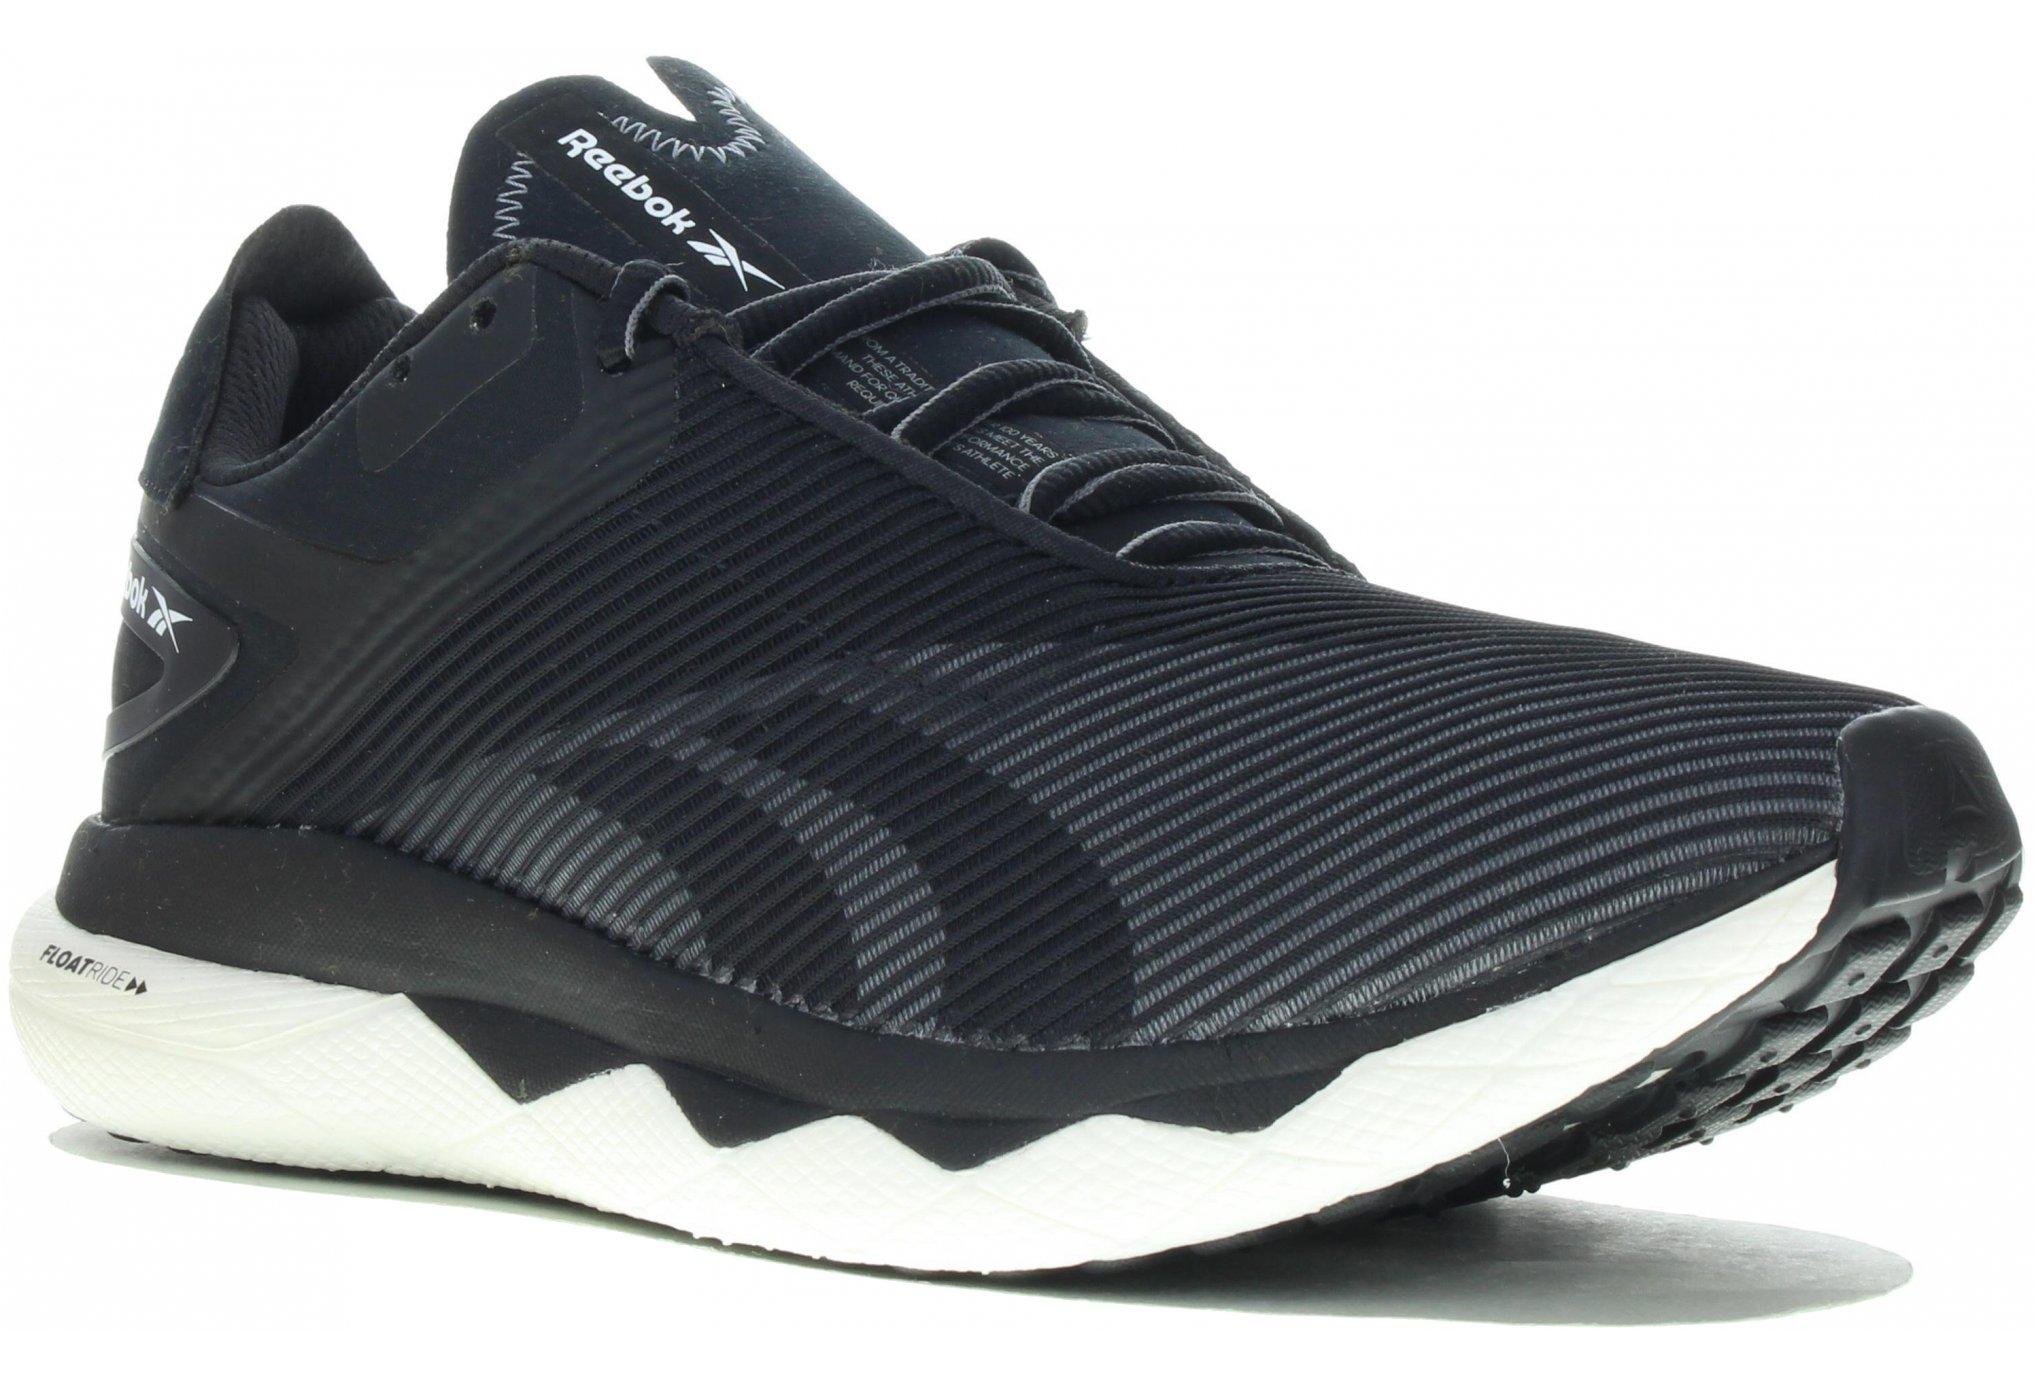 Reebok Floatride Run Panthea Chaussures homme